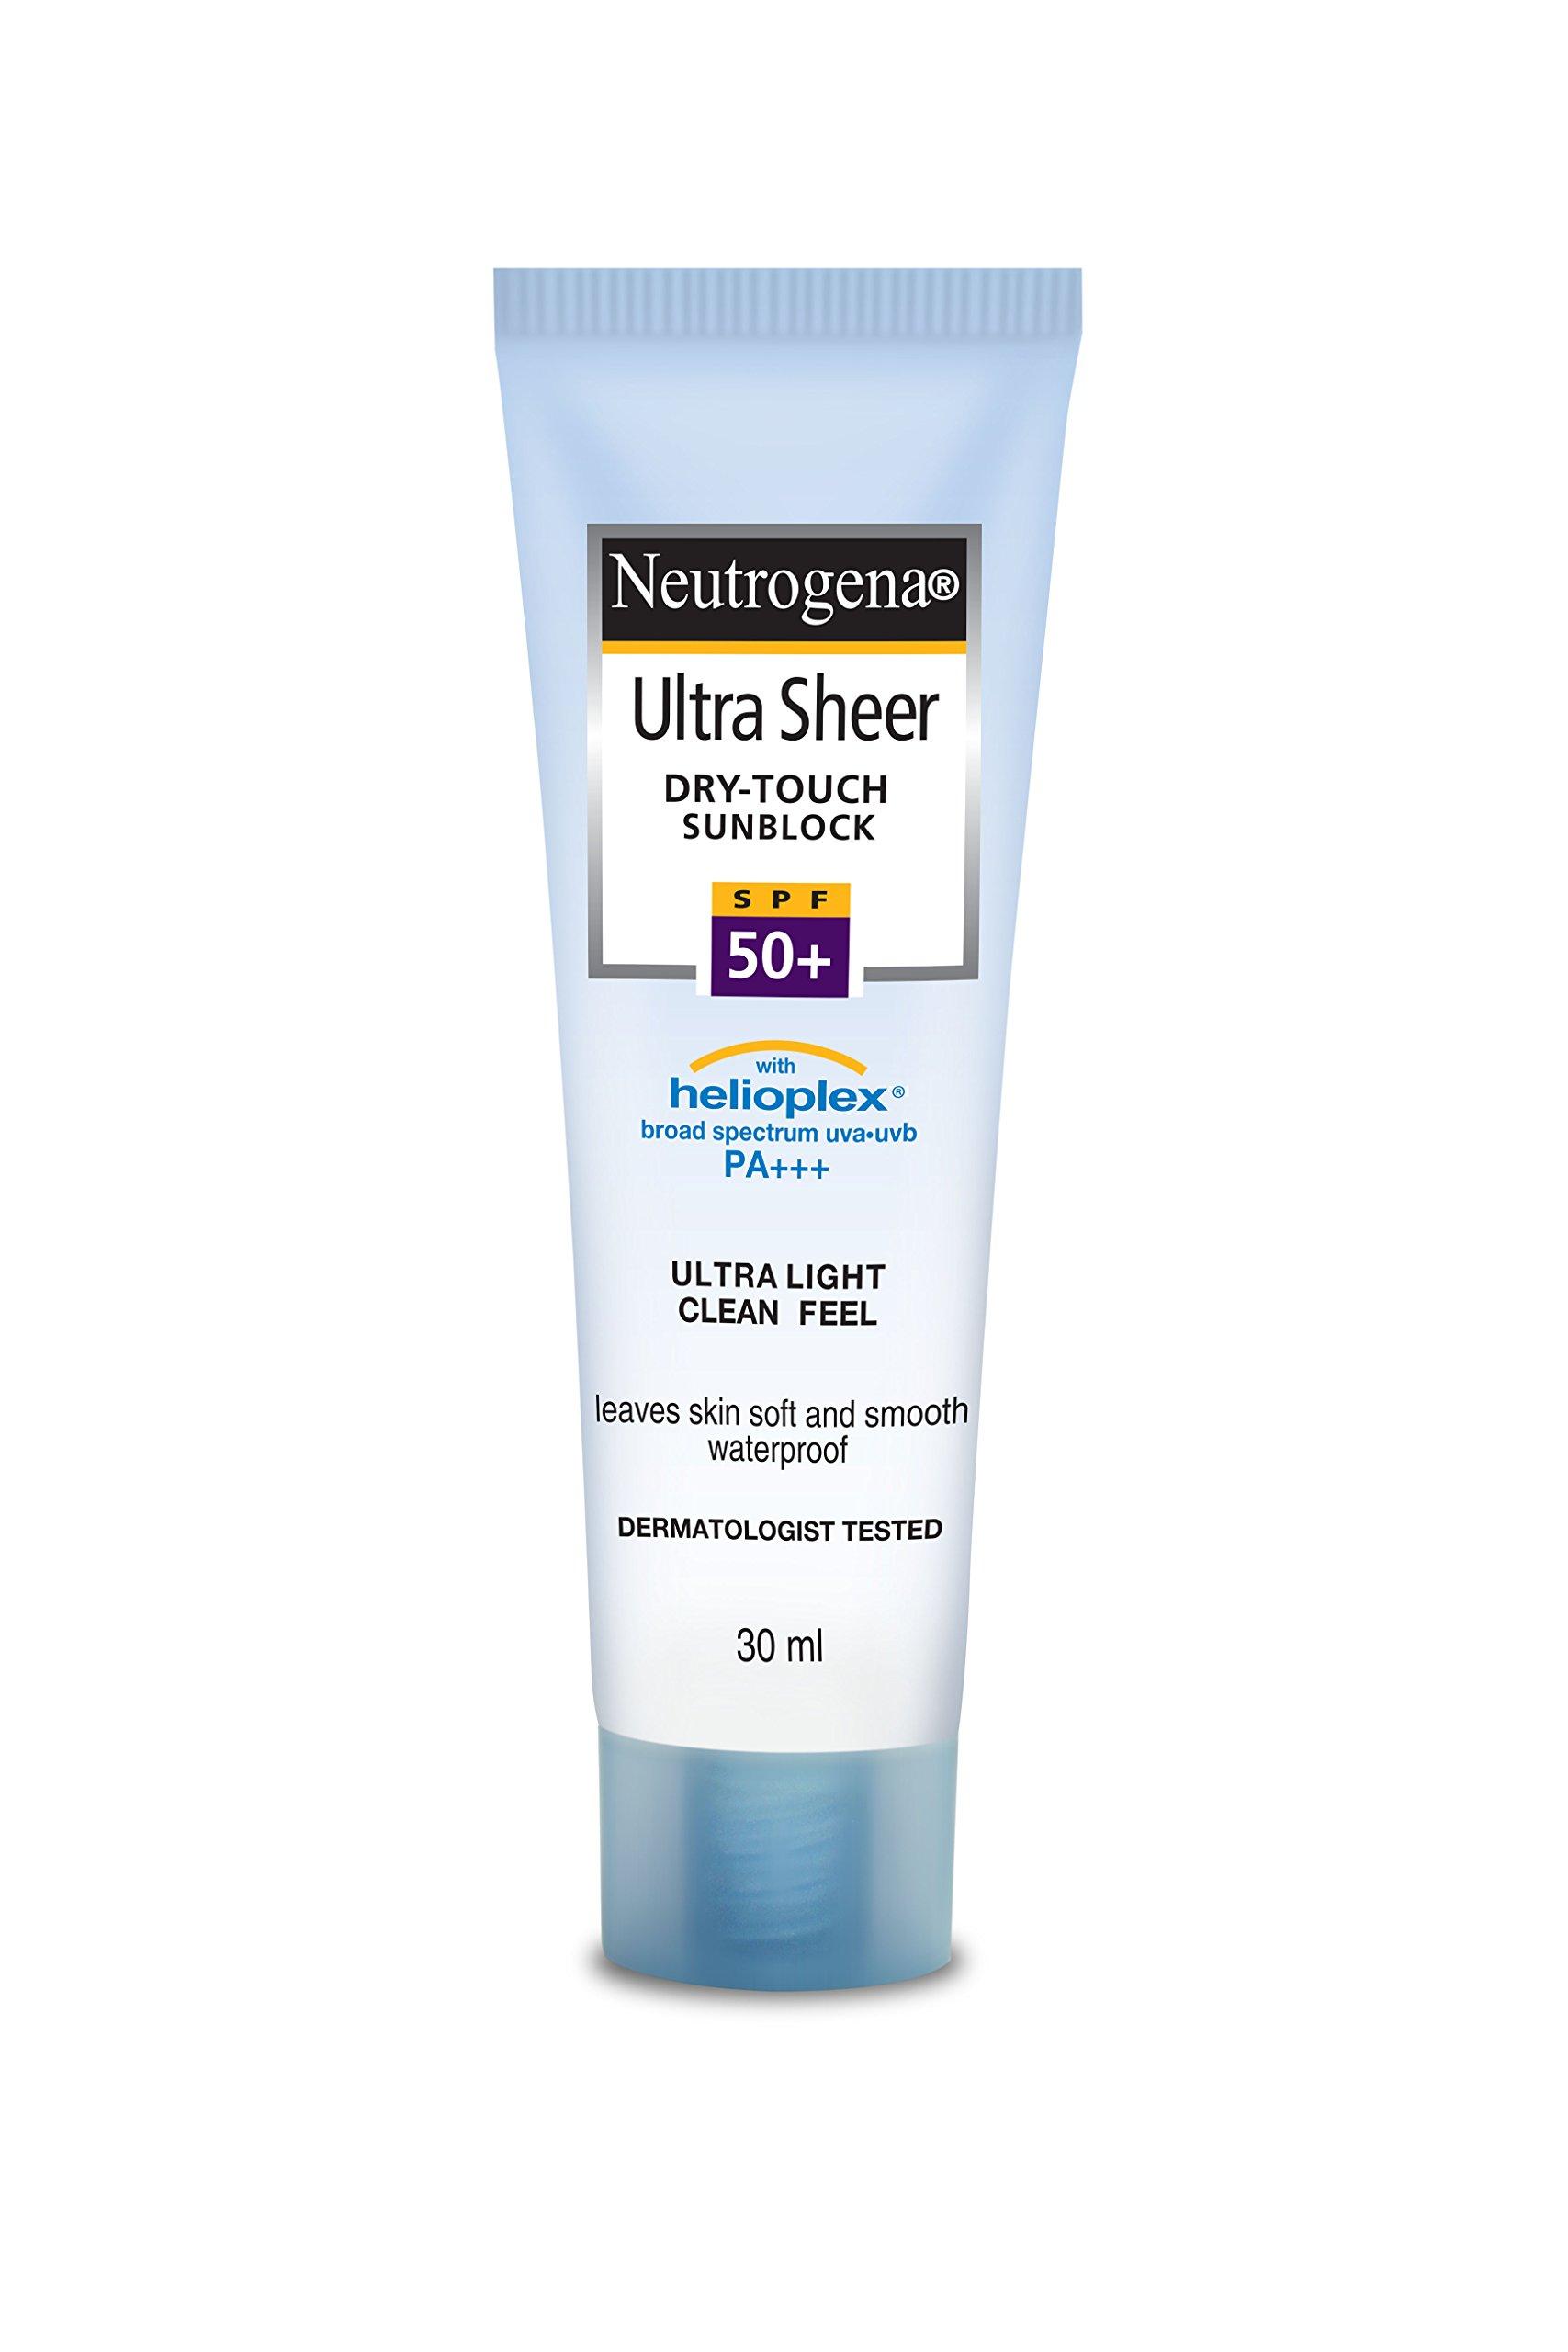 Neutrogena Ultra Sheer Dry Touch Sunblock, SPF 50+, 30ml product image